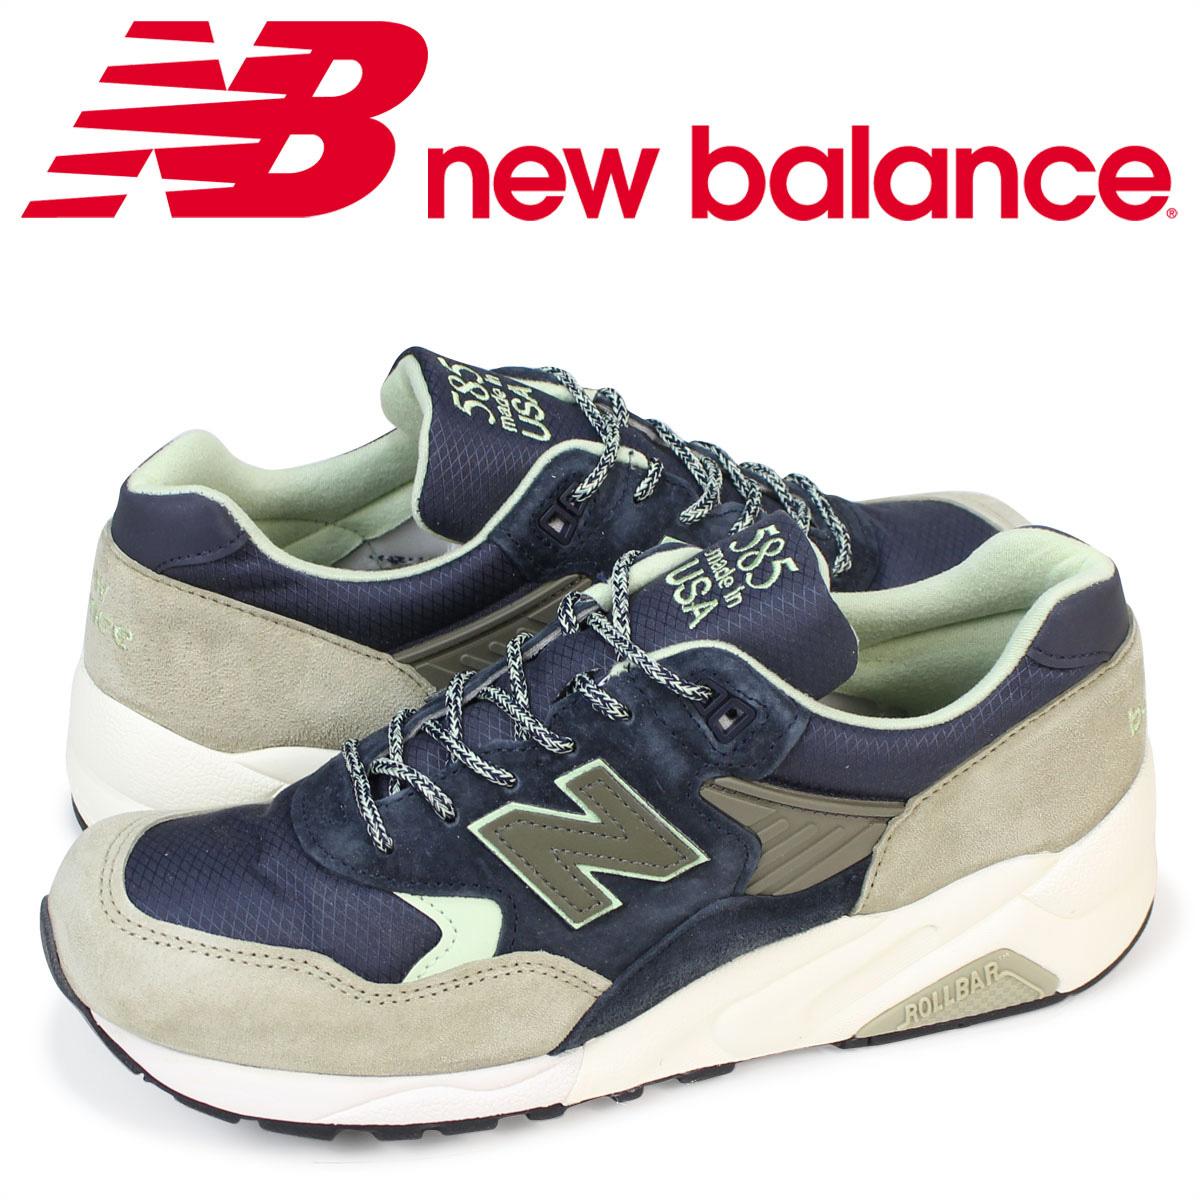 new balance men's tr